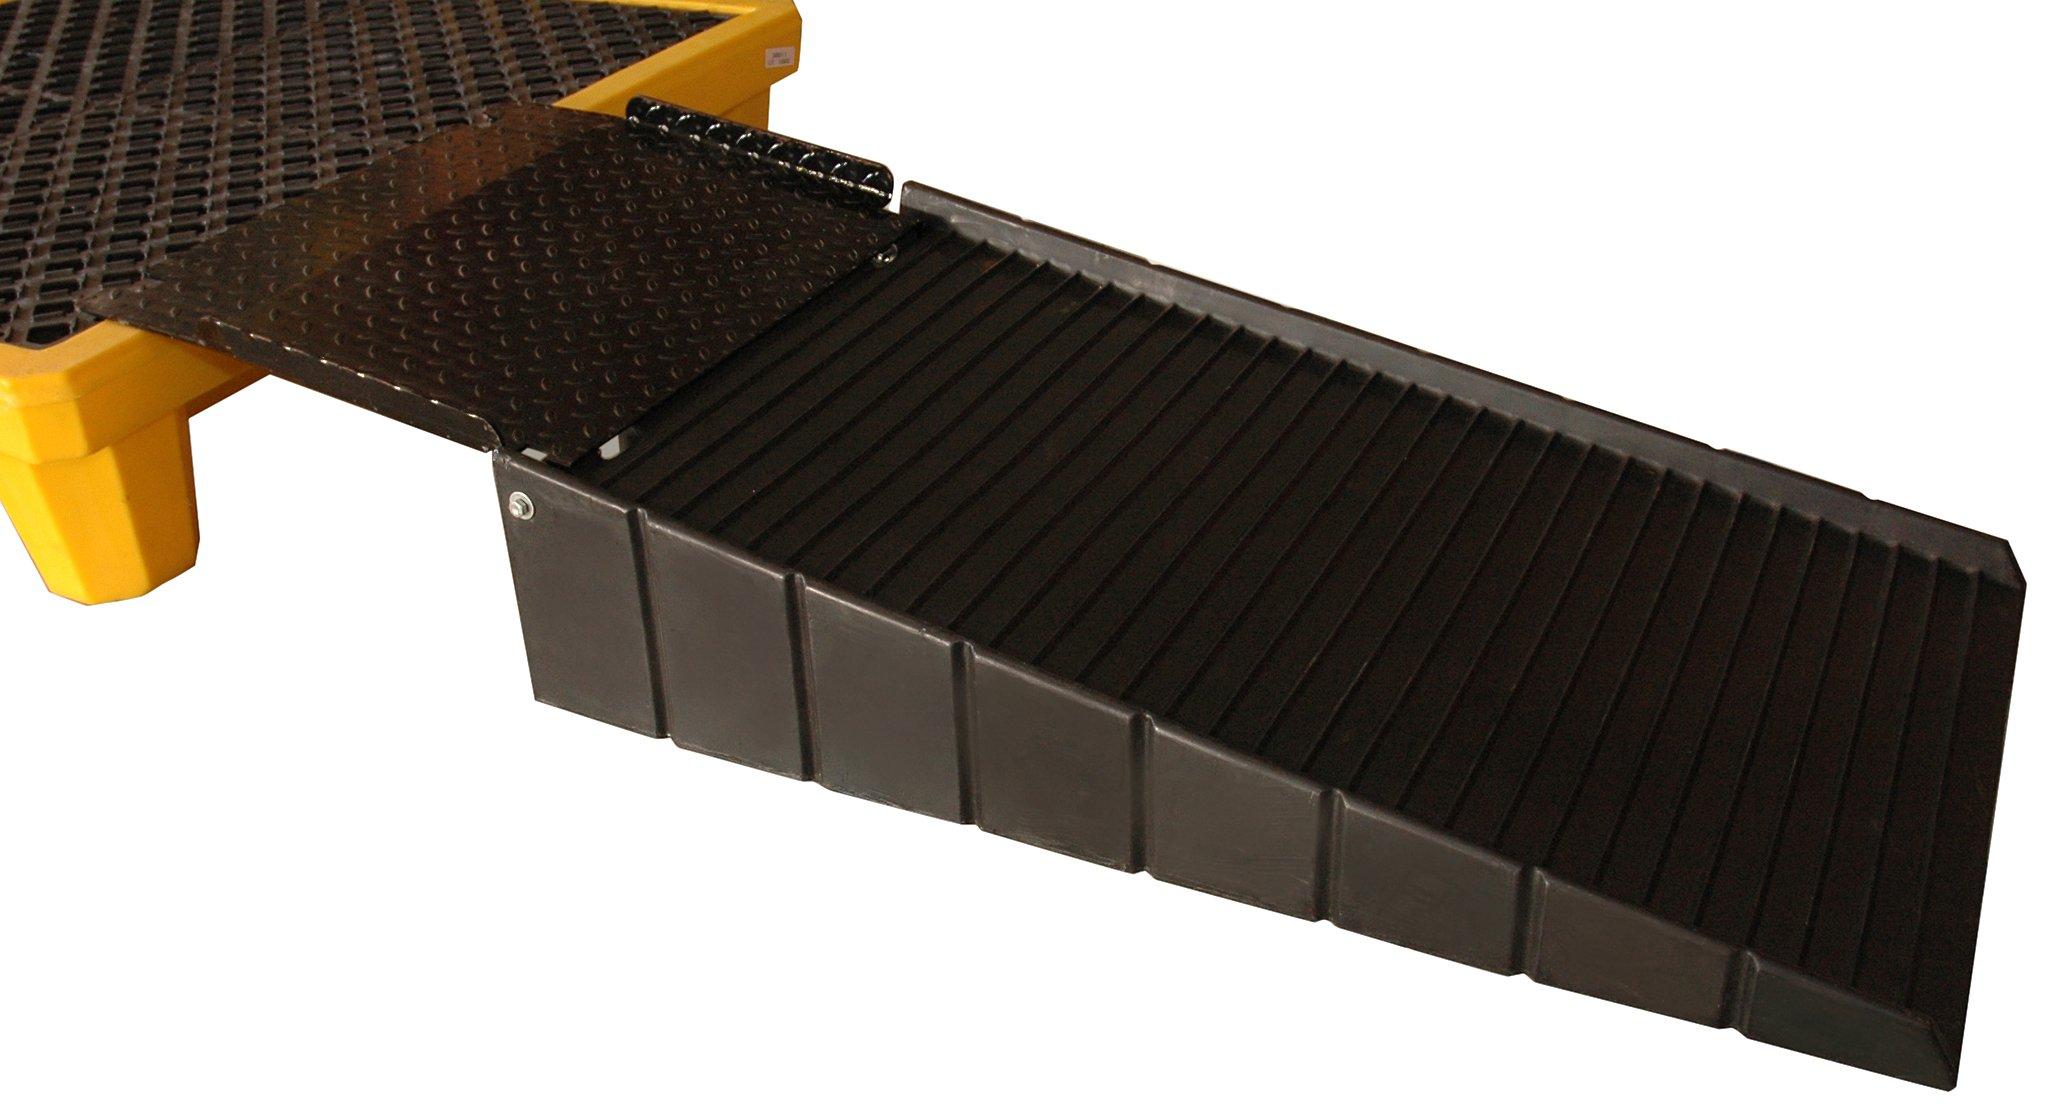 UltraTech 0678 Polyethylene Loading Ramp with 21'' Plate, 700 lbs Capacity, 5 Year Warranty, Black